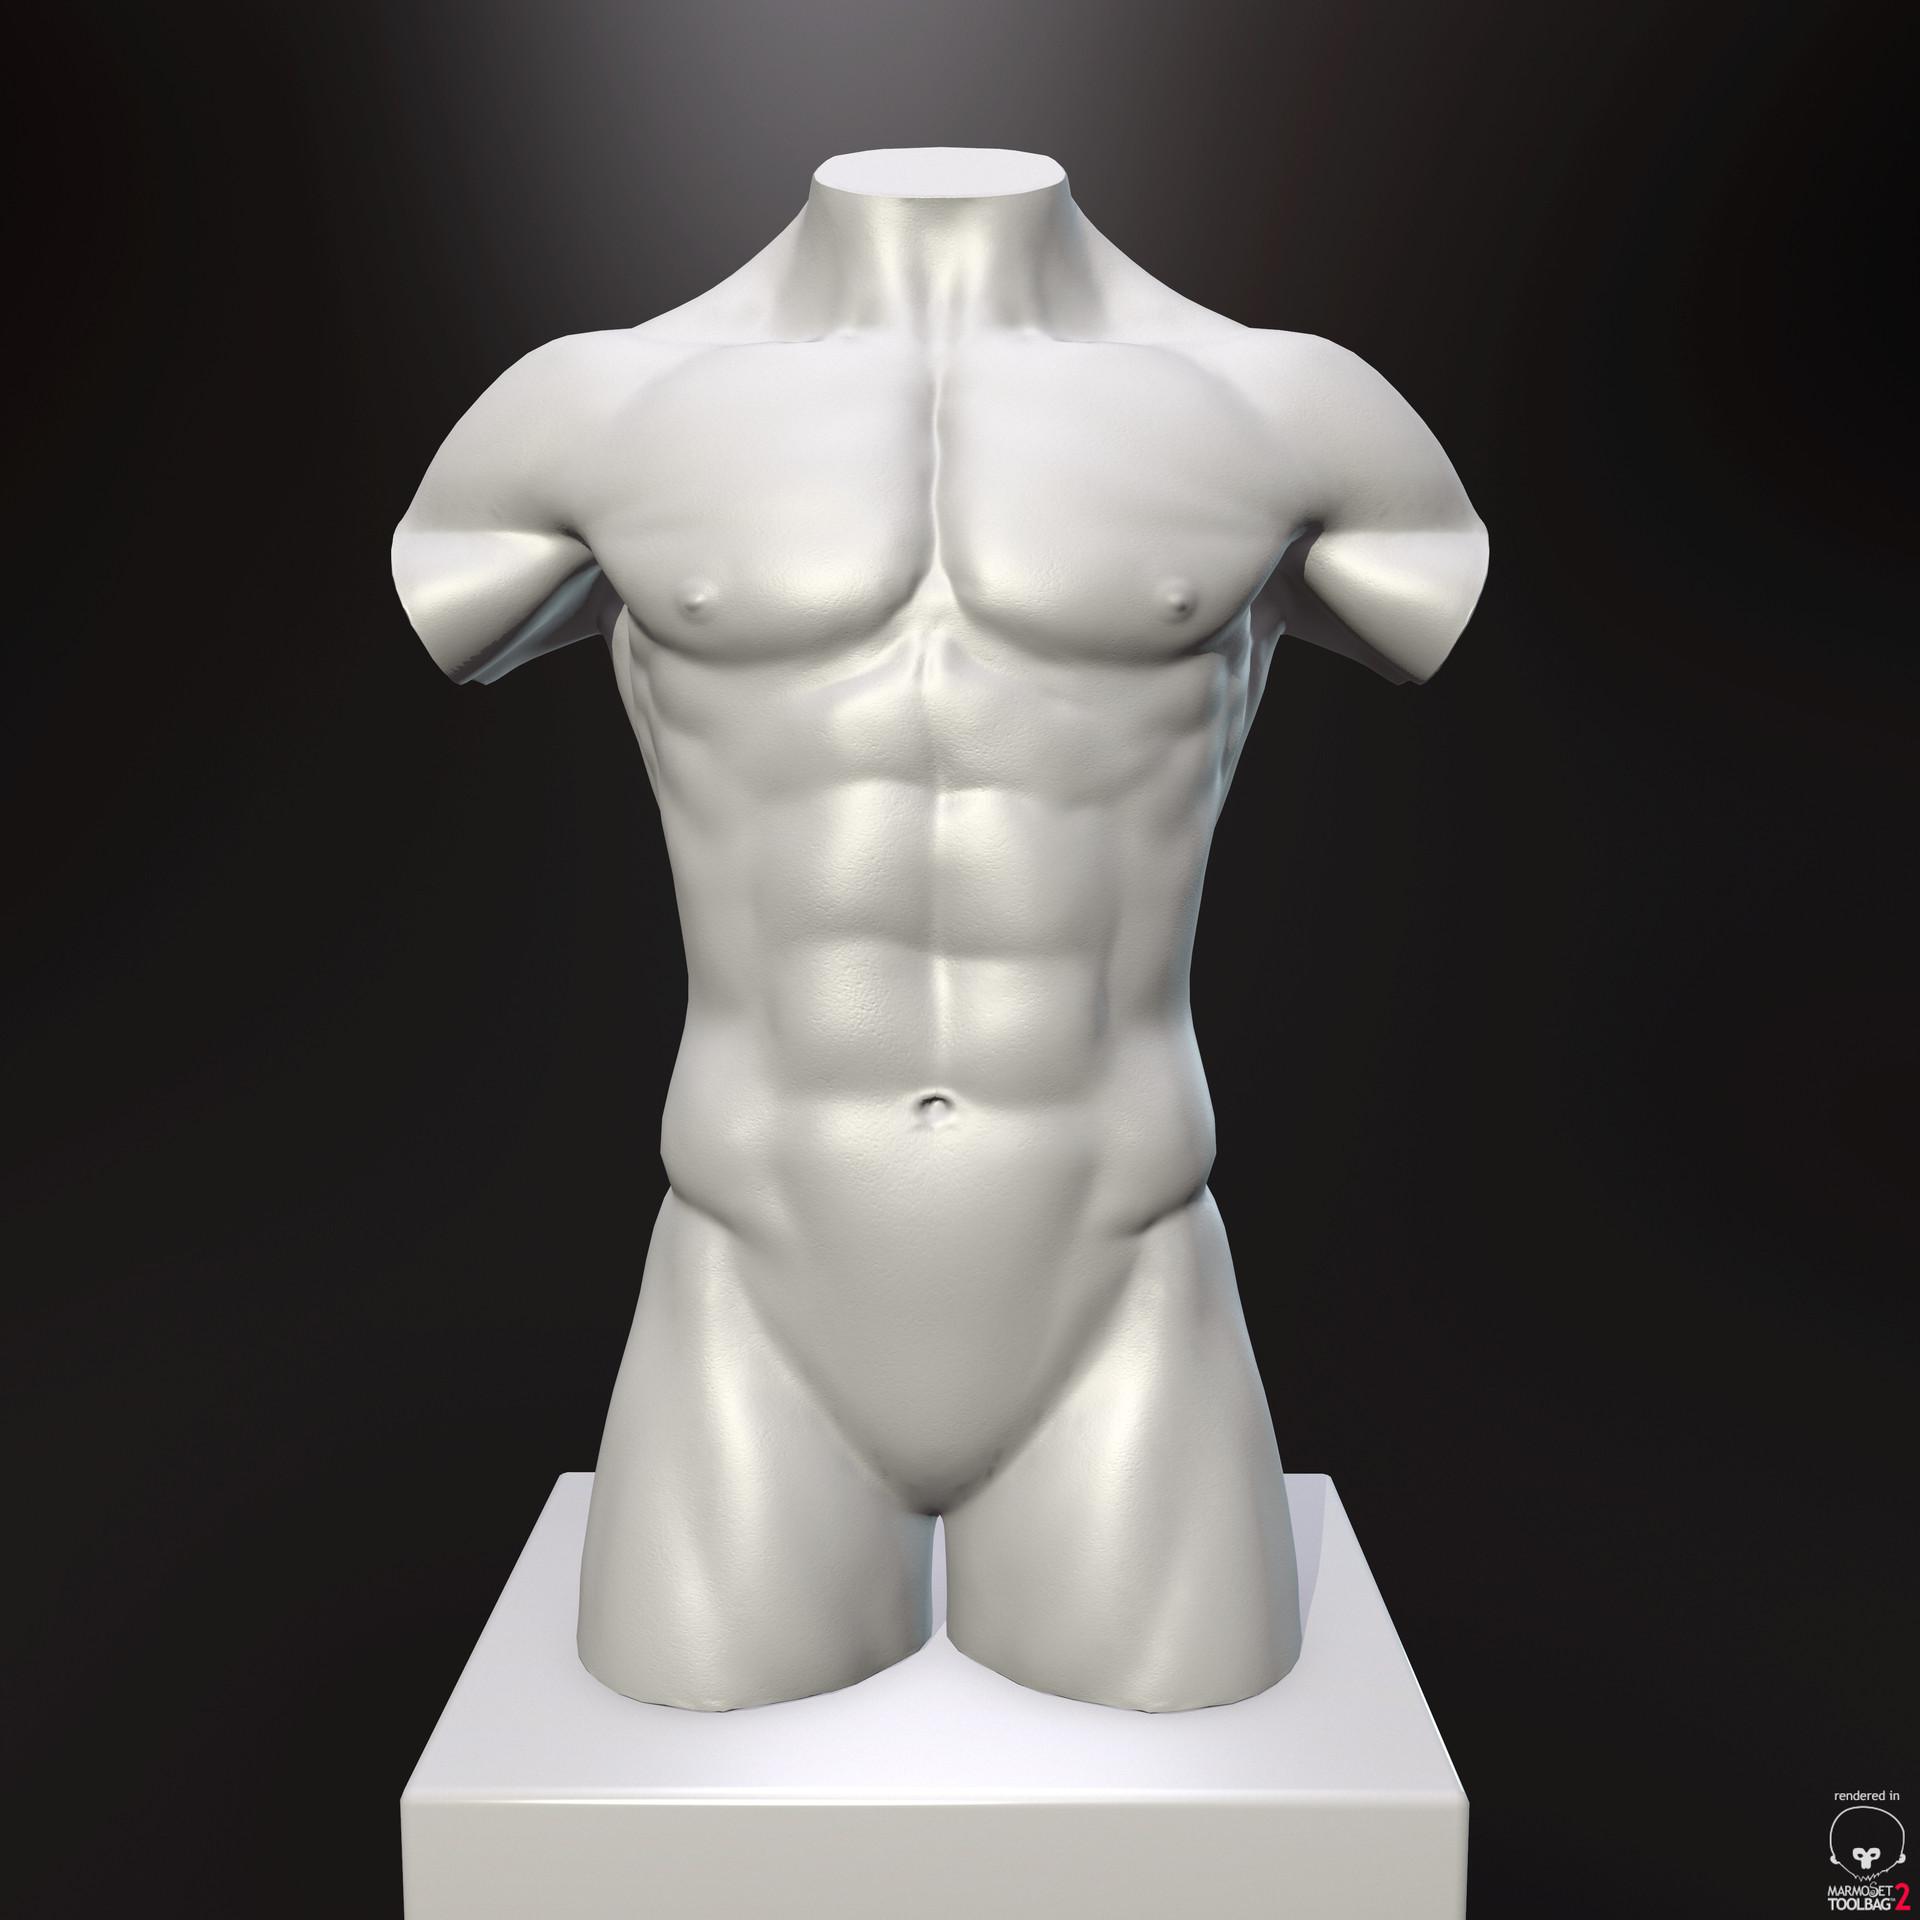 Marc virgili torso 03